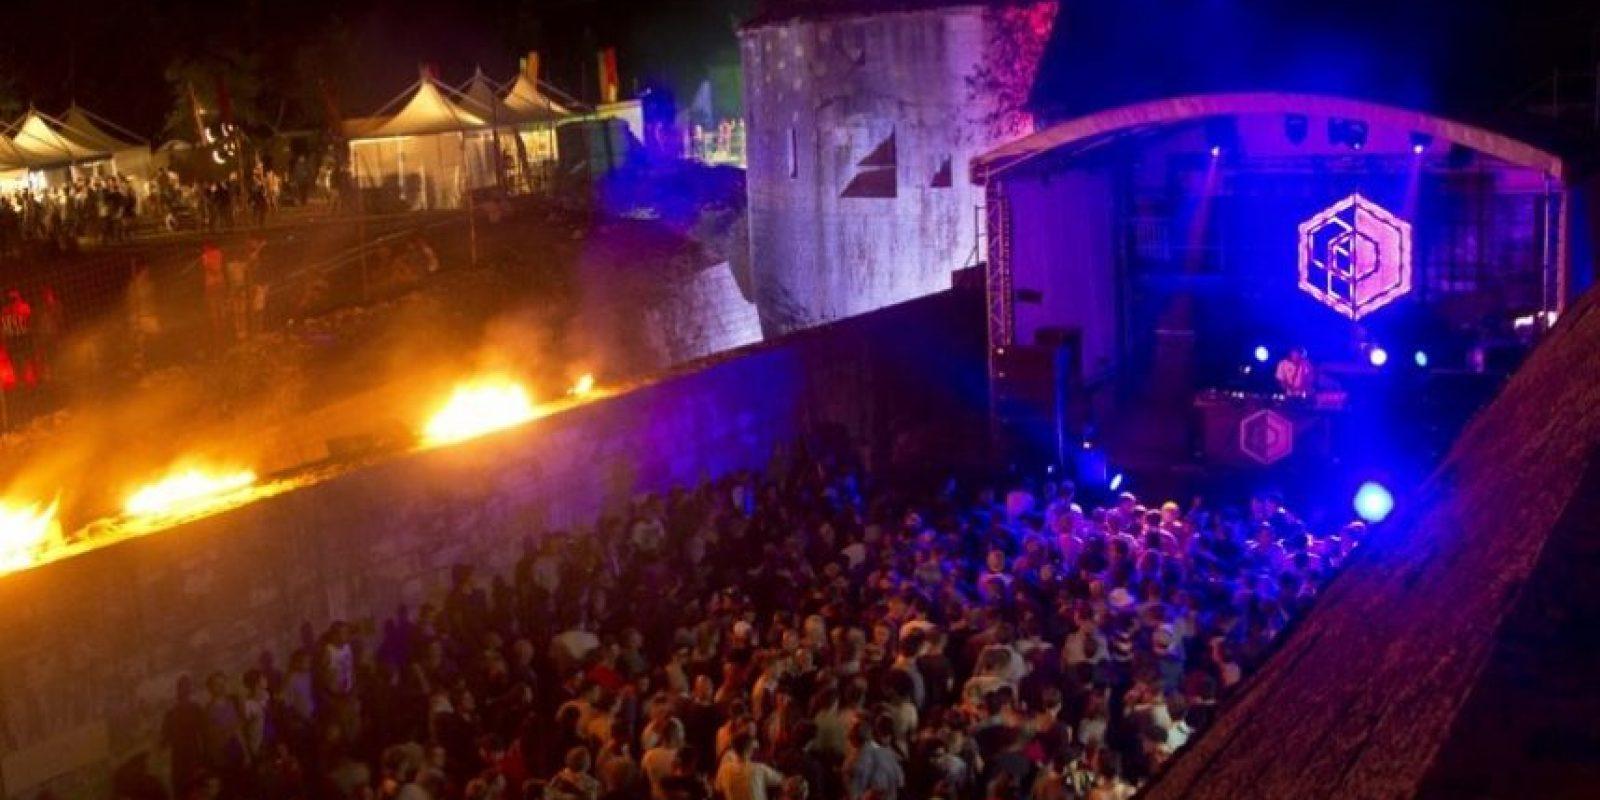 Anfiteatro romano en Croacia de noche Foto:Wikimedia